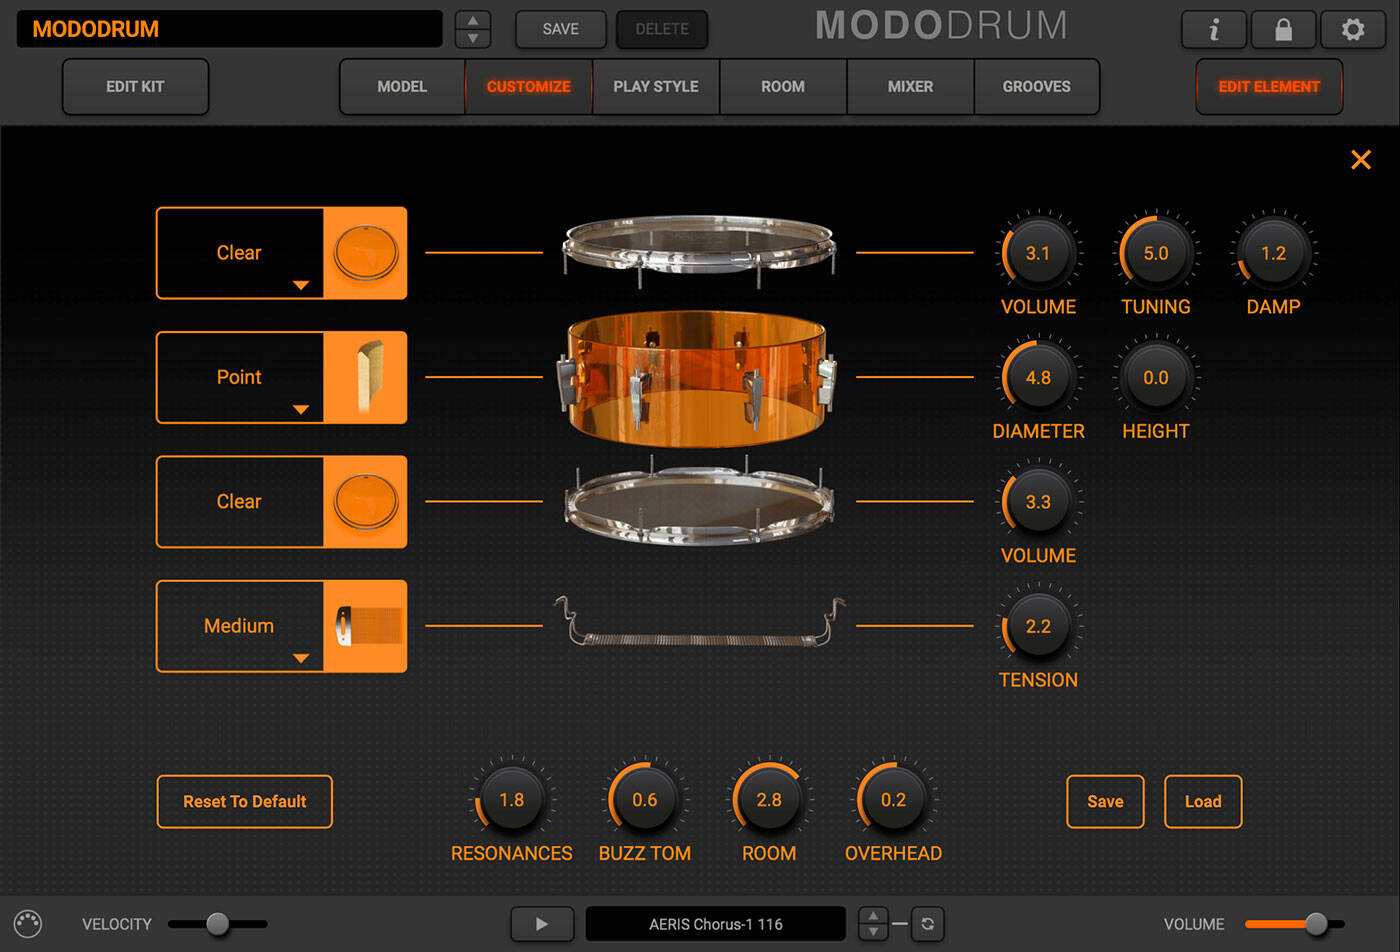 modo_drum_customize_snare_plexi